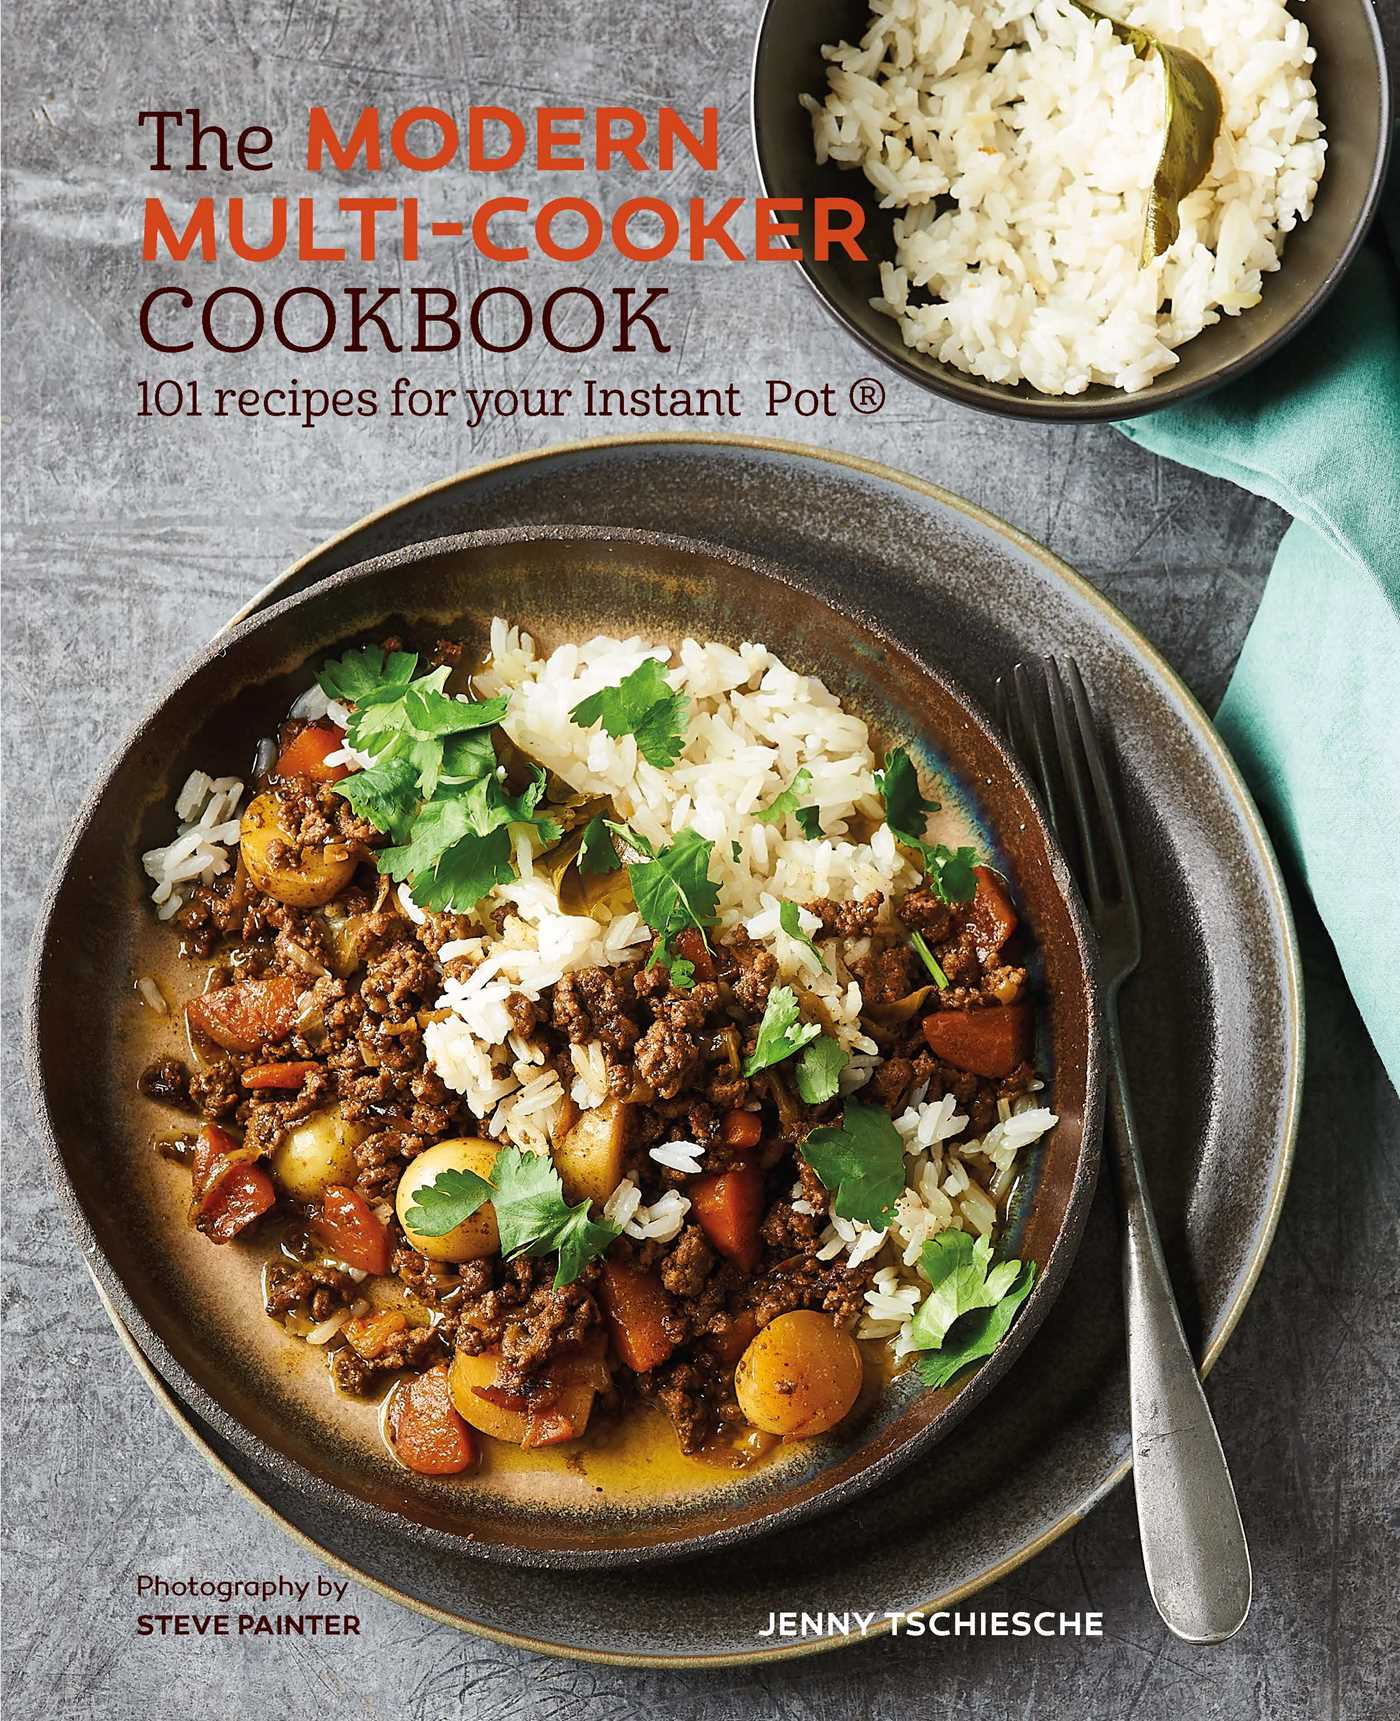 The modern multi cooker cookbook 9781849759731 hr